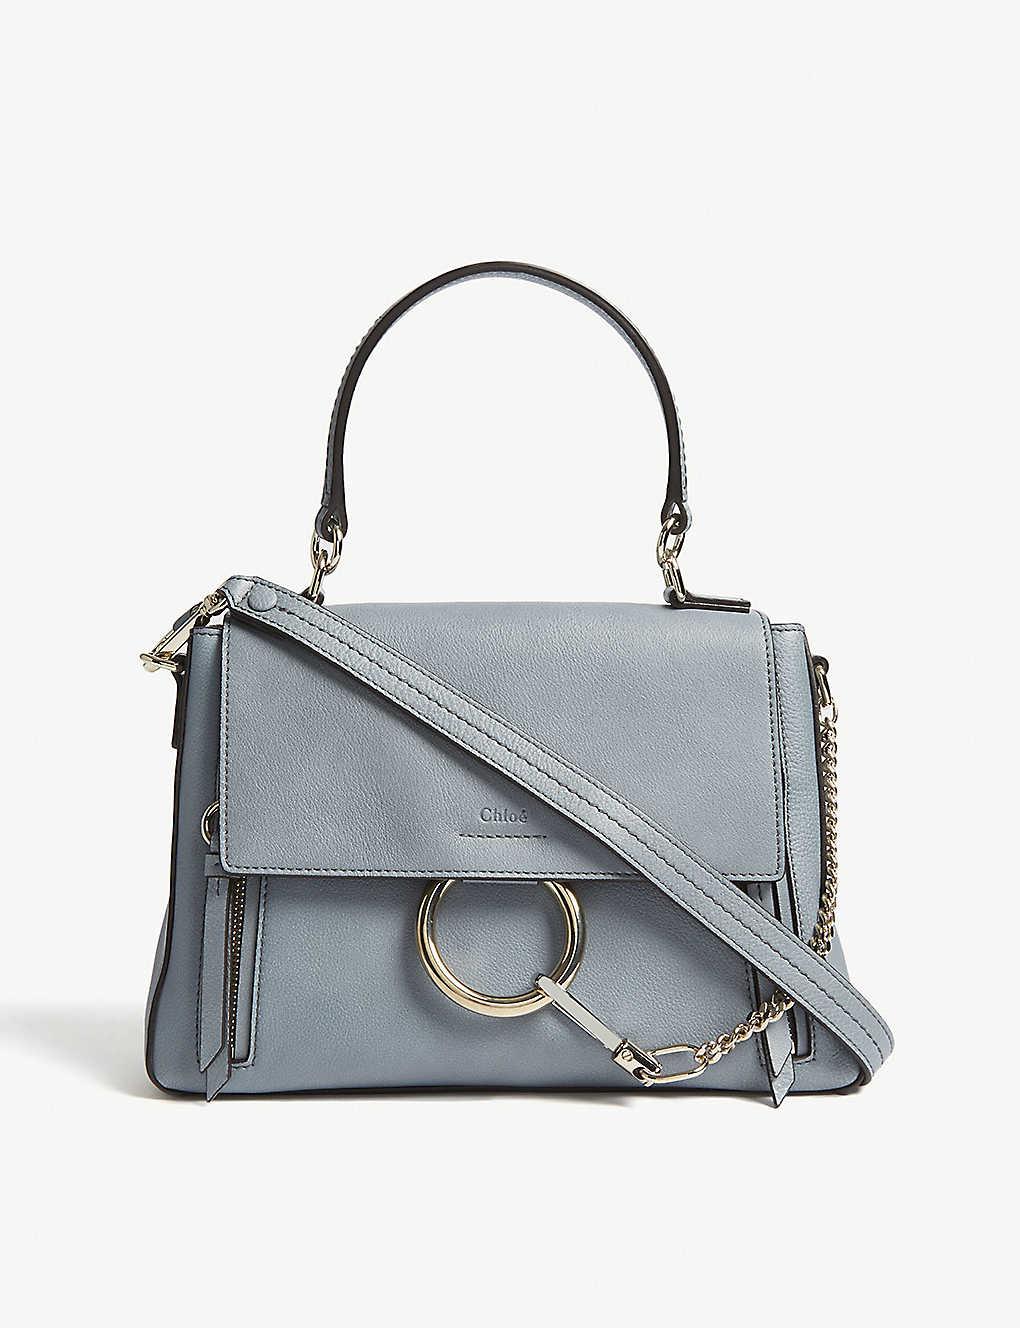 19ce81636 CHLOE - Small Faye Day leather shoulder bag   Selfridges.com